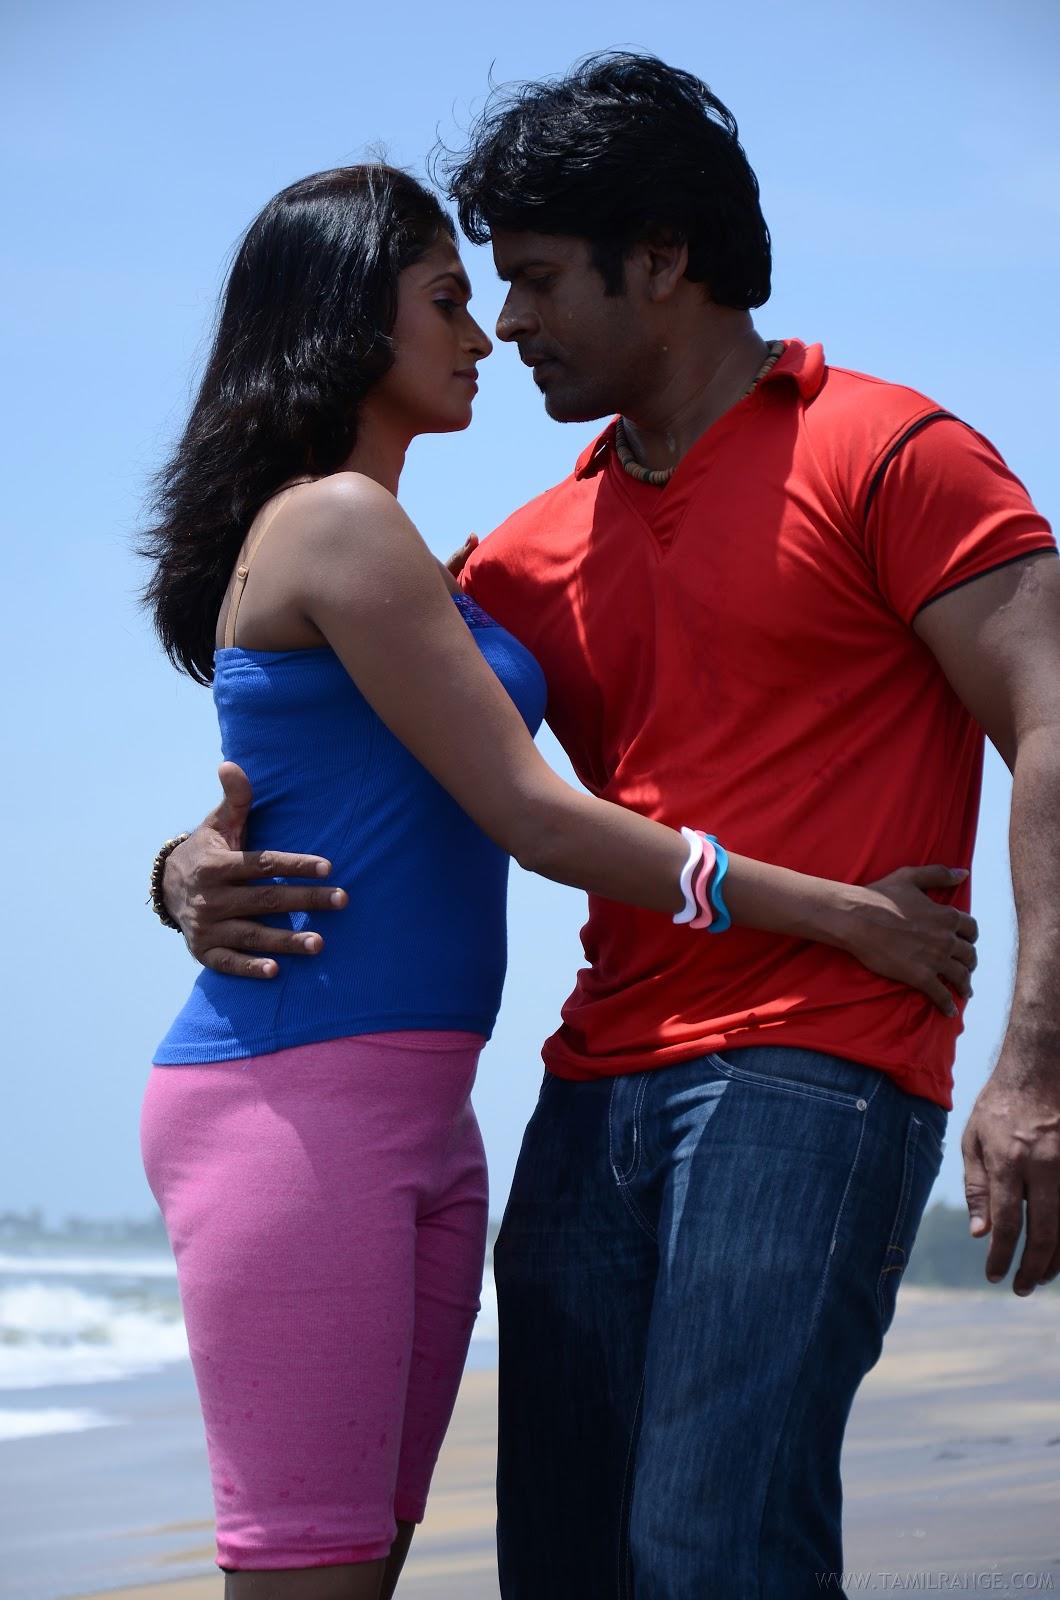 tamil movie latest hot spicy stills photos   cine way tamil cinema